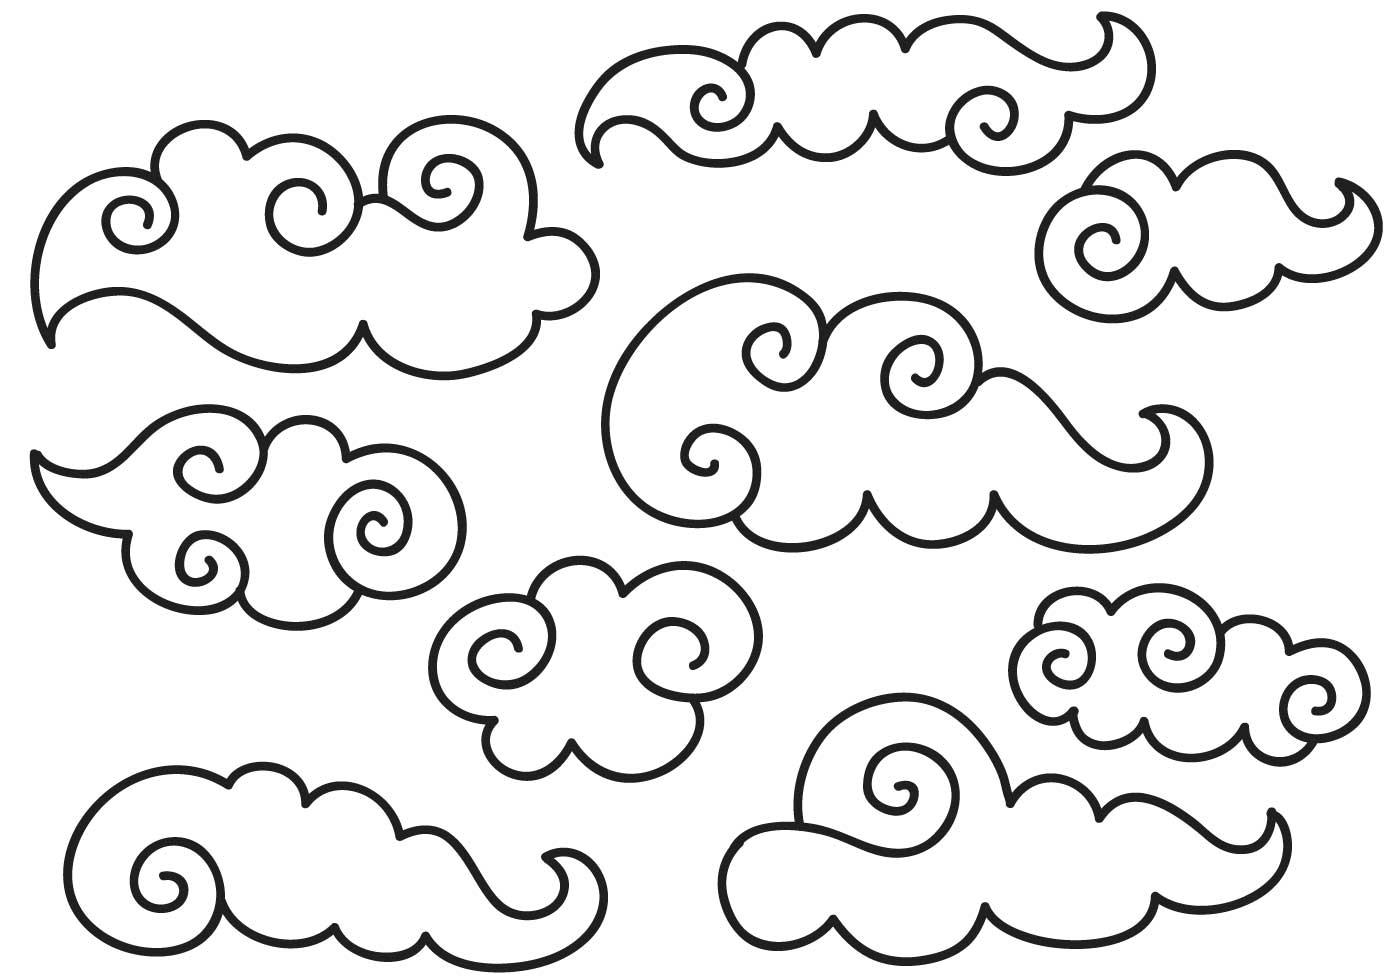 135 Most Original Cloud Tattoos  Tattoo Models Designs